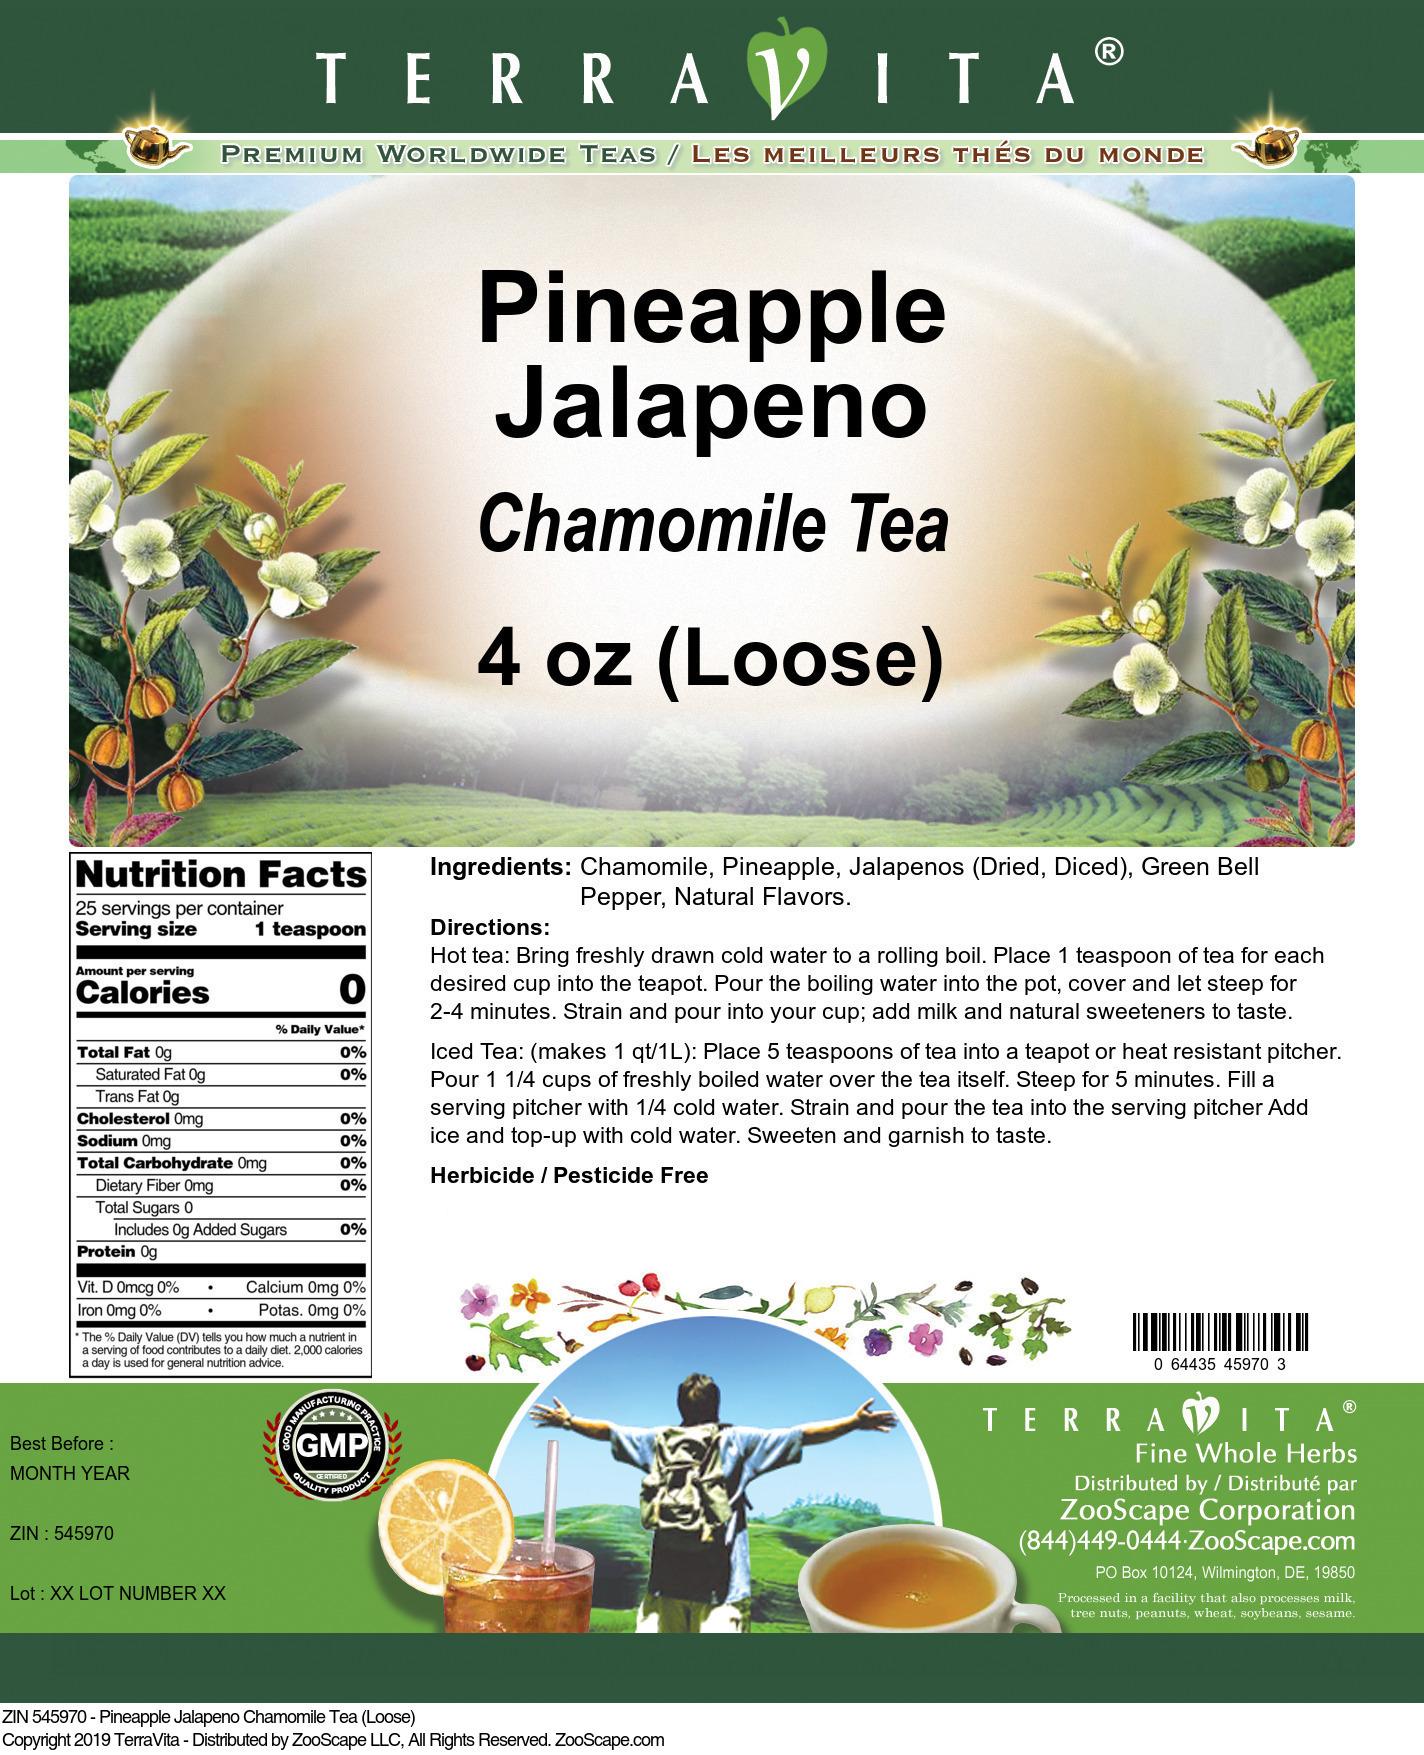 Pineapple Jalapeno Chamomile Tea (Loose)